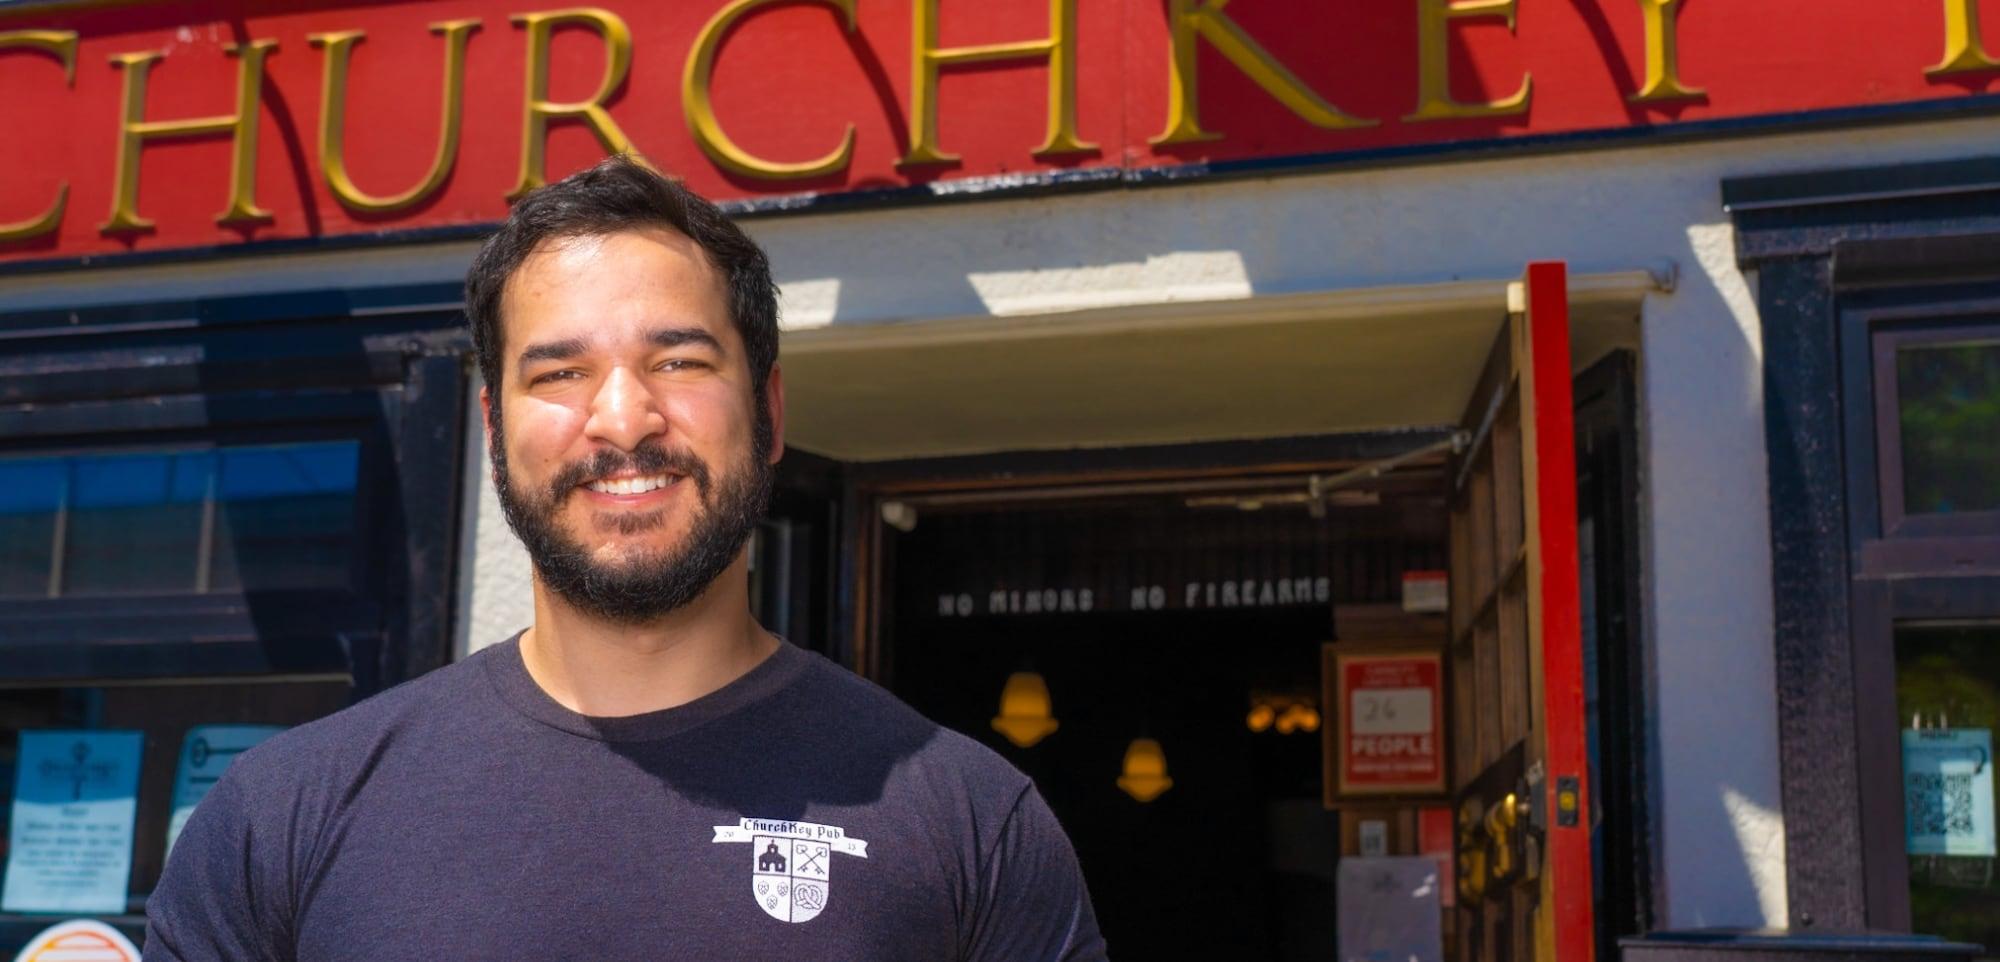 The ChurchKey Pub in Downtown Edmonds